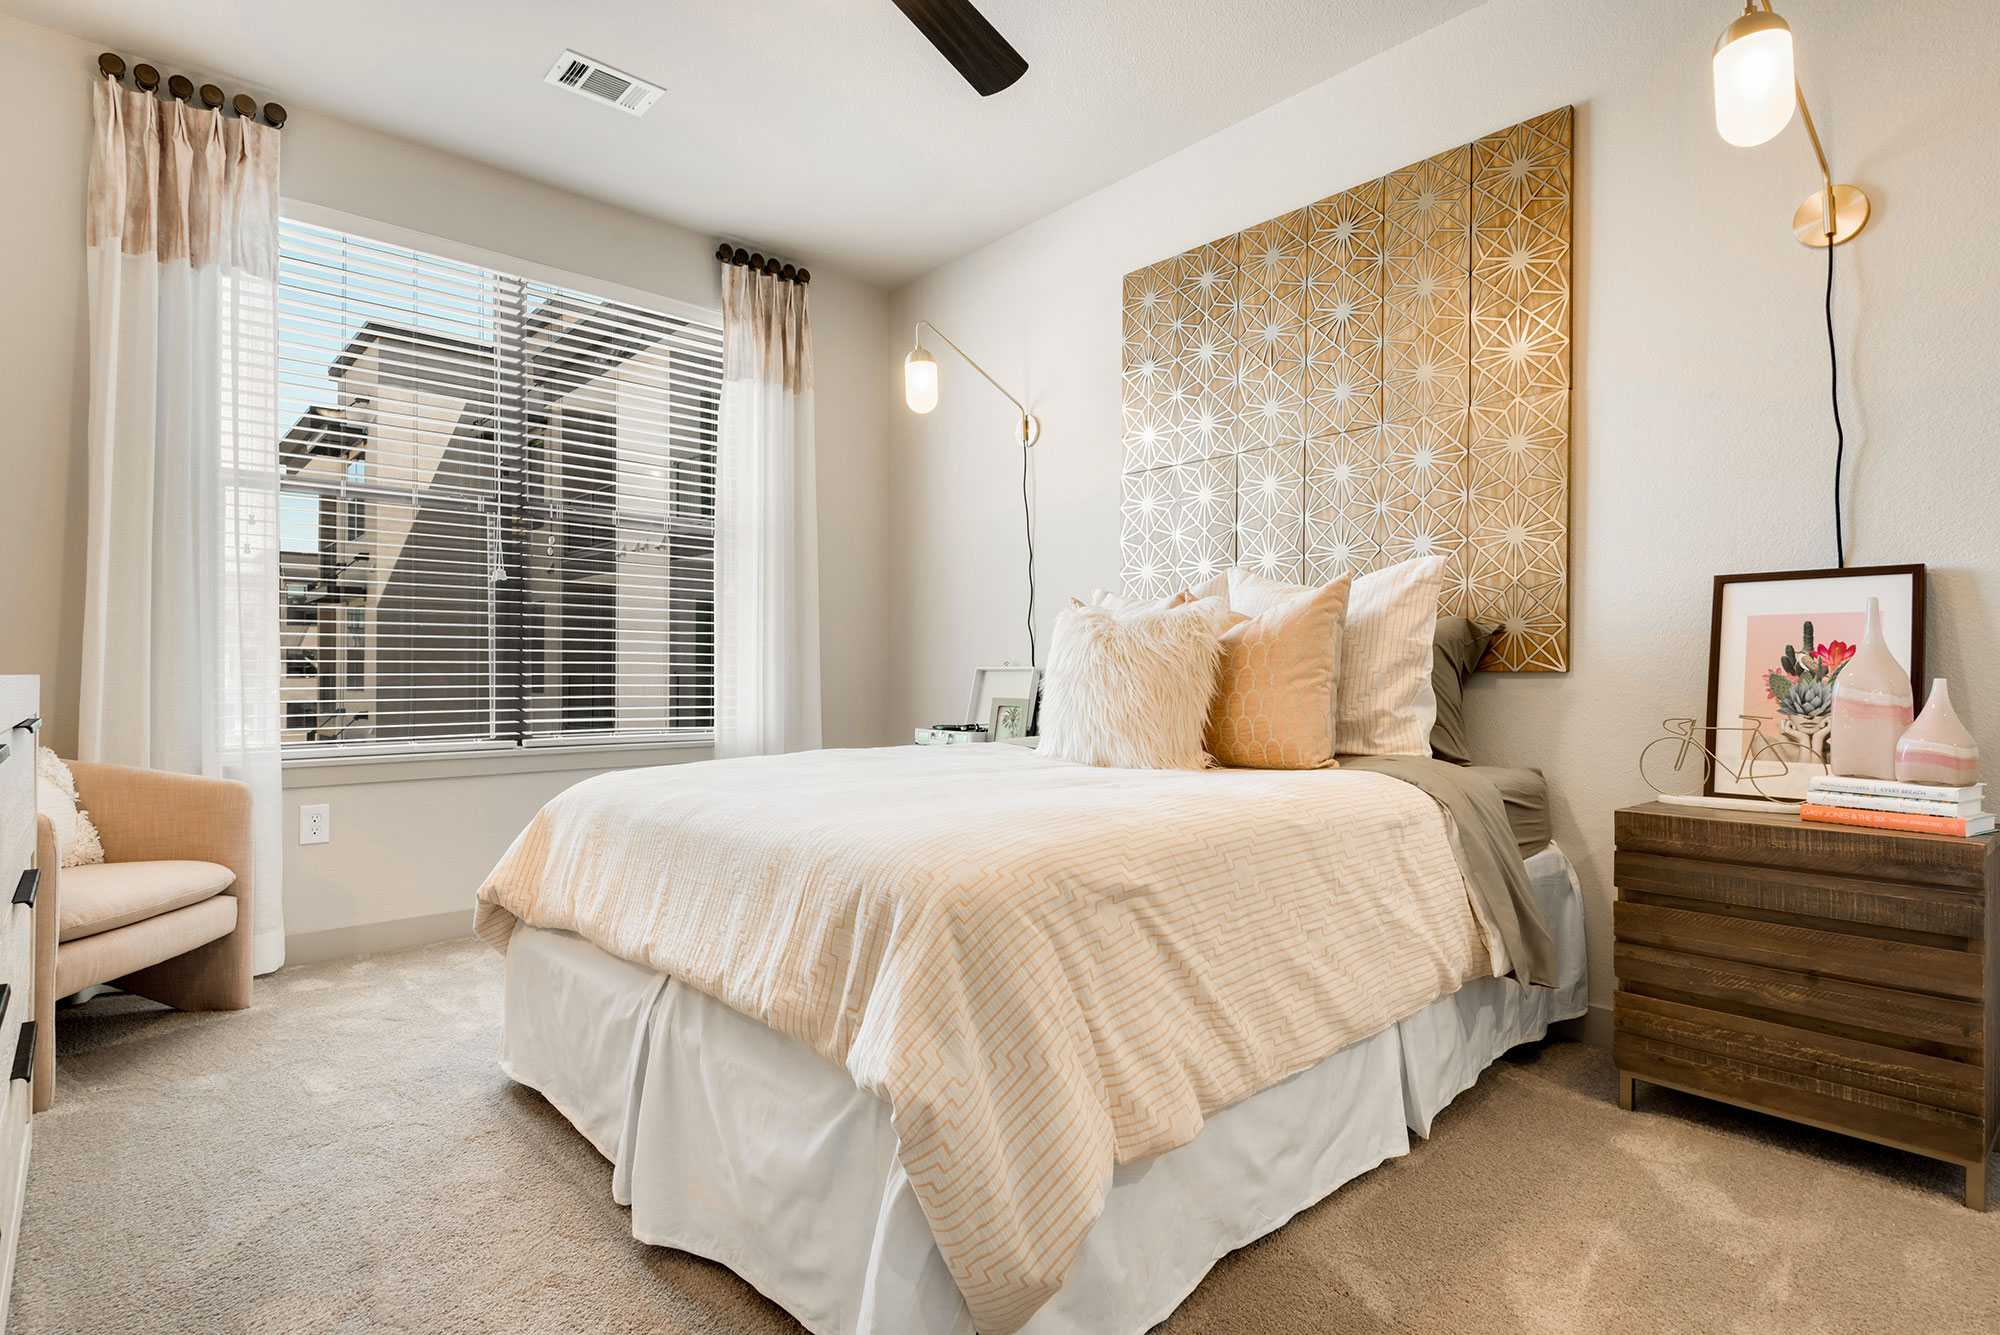 Riata - Model Unit - Bedroom wide view